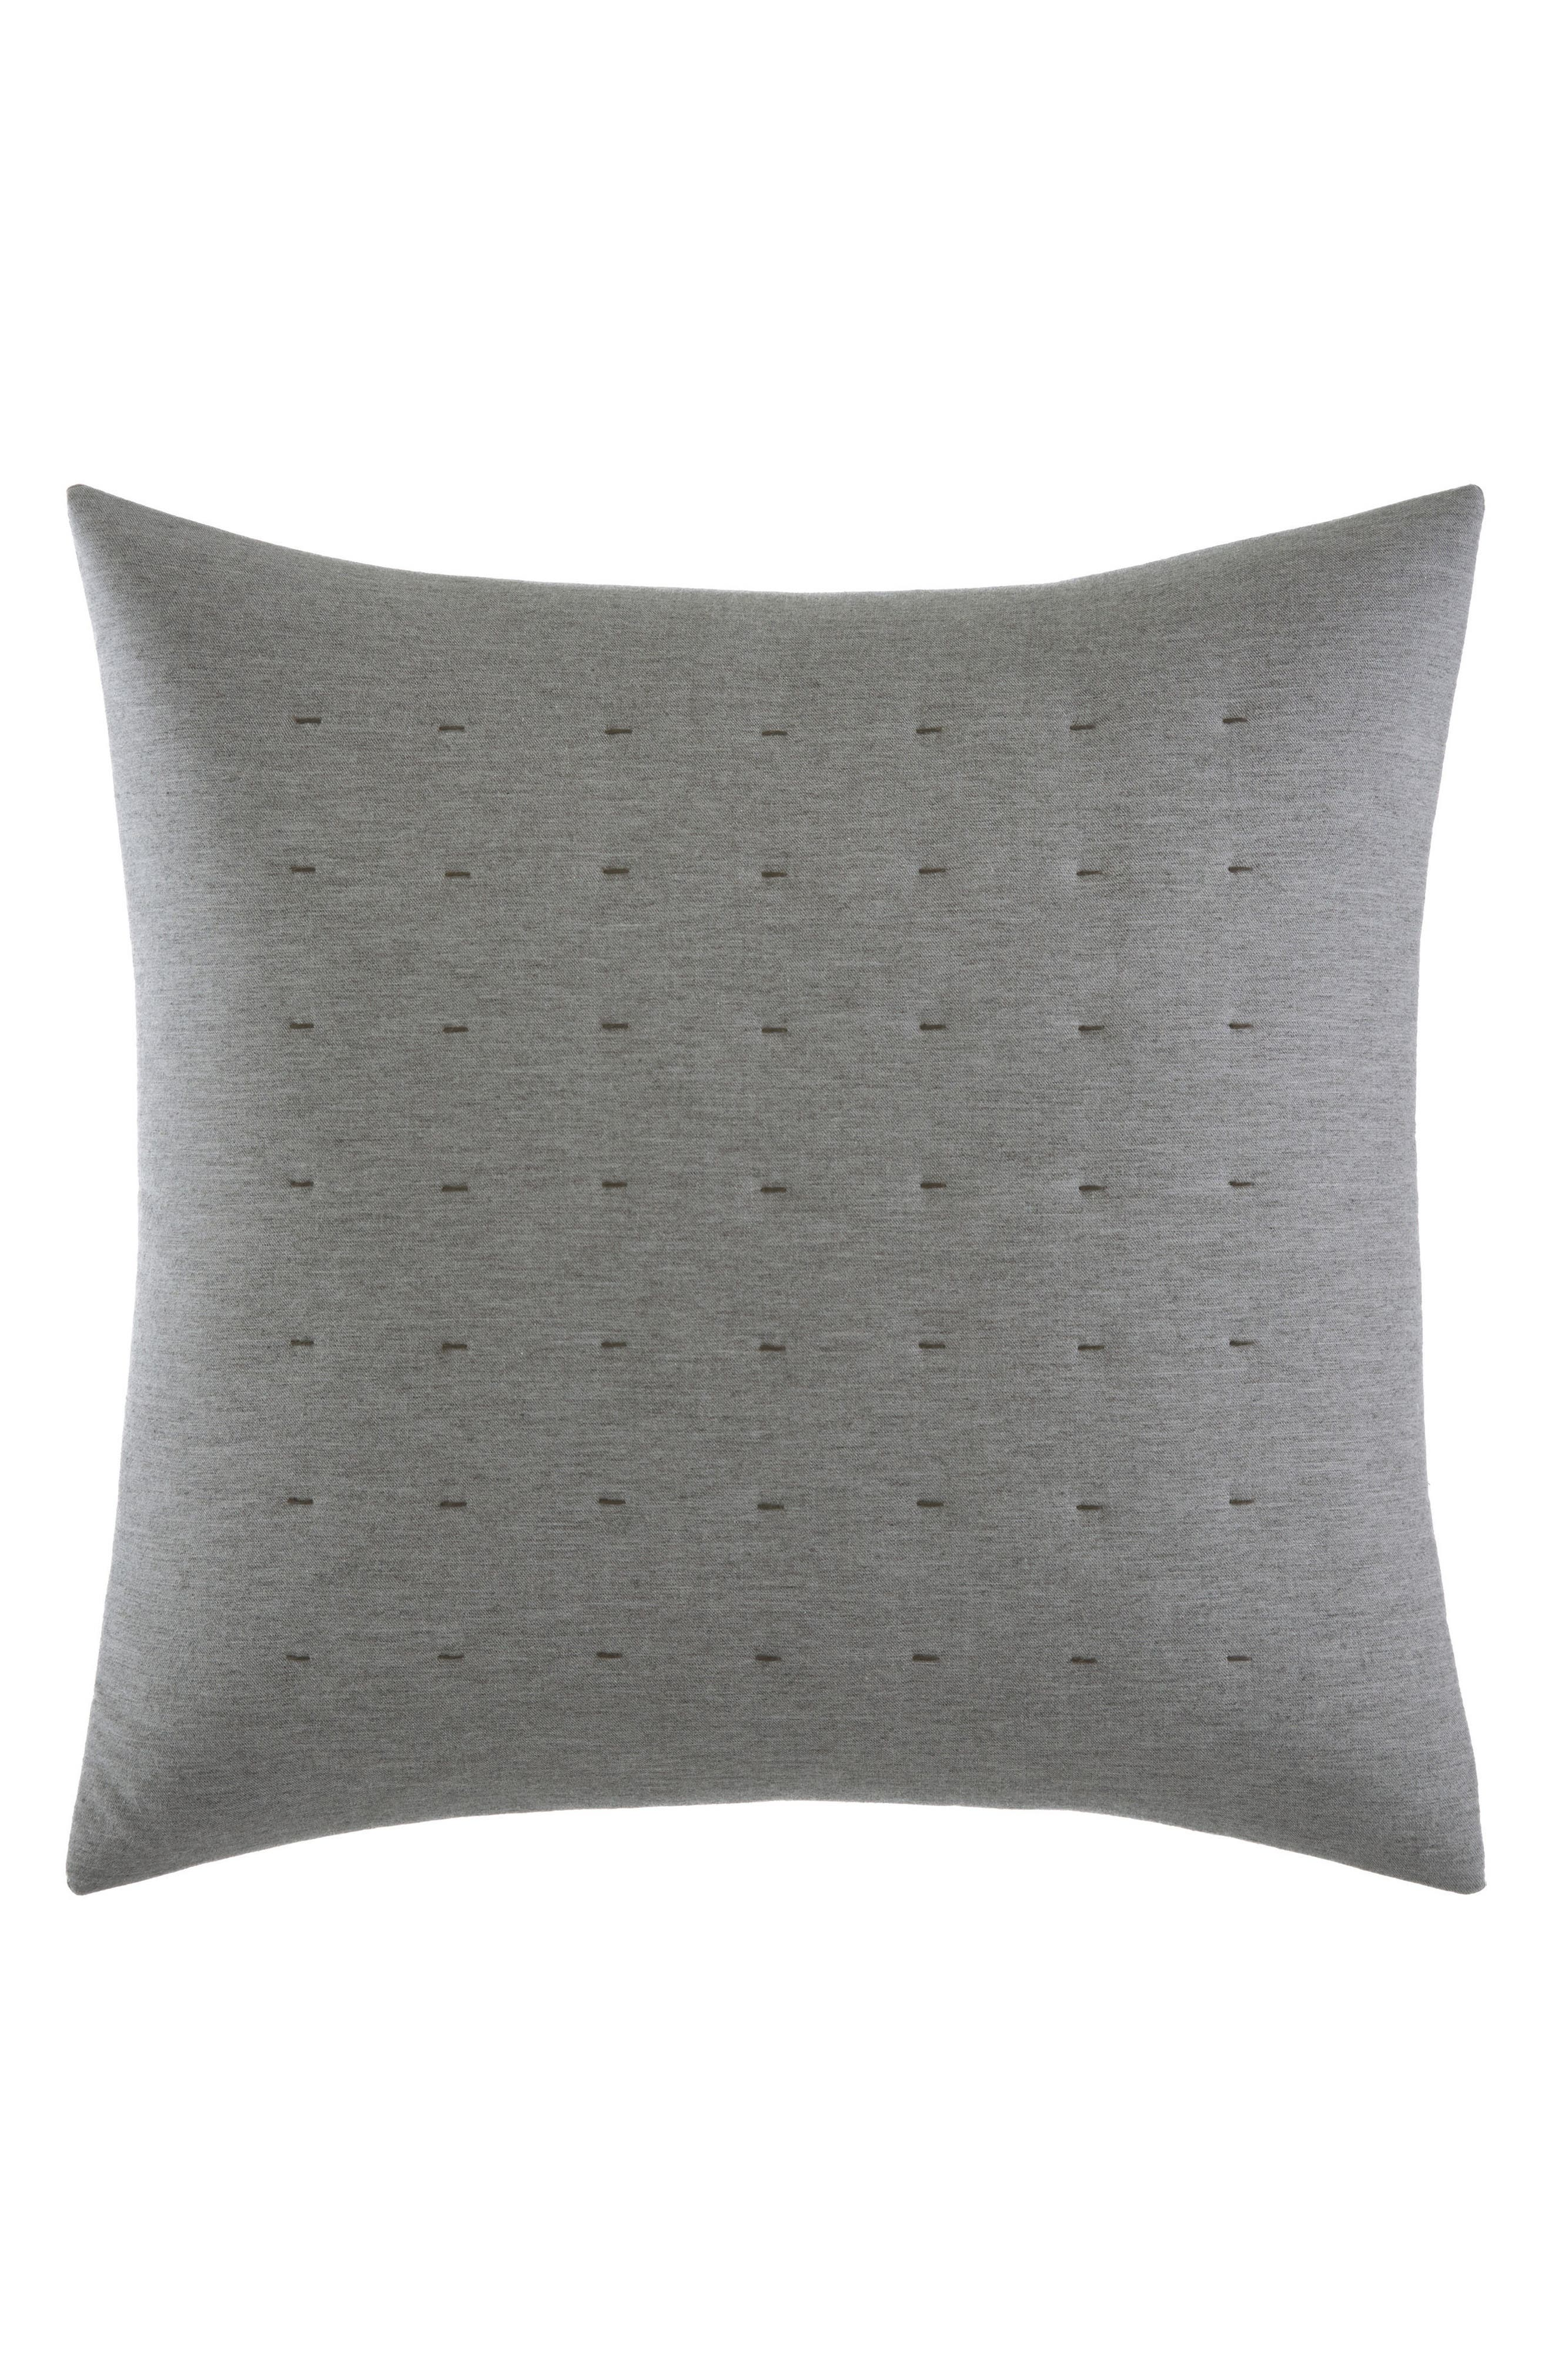 Tuille Accent Pillow,                         Main,                         color, Medium Gray